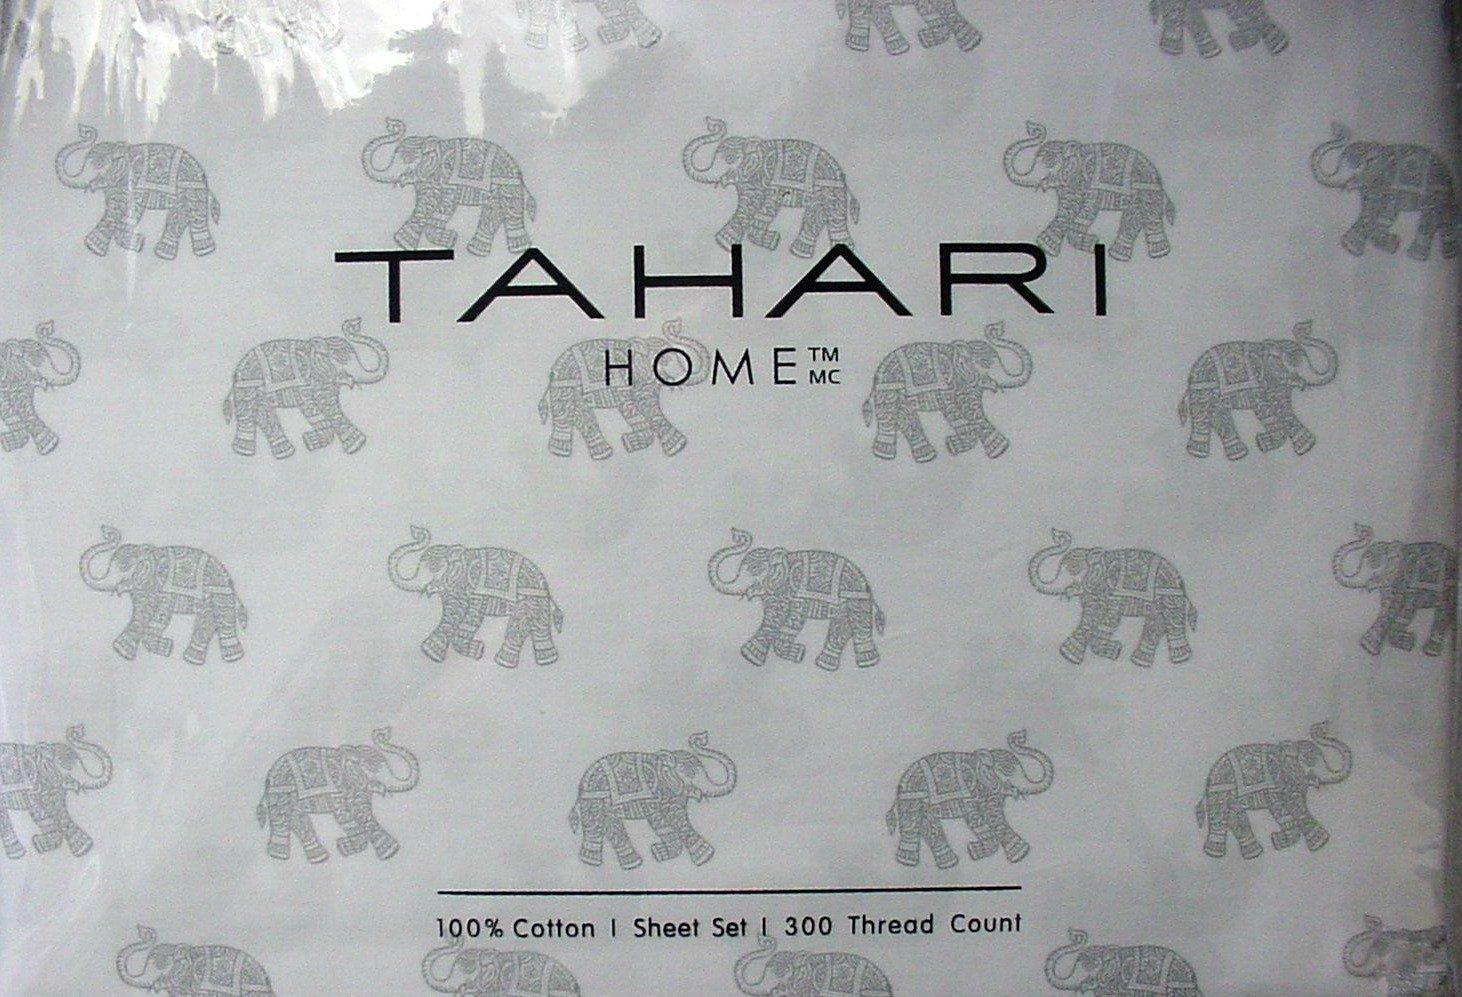 Tahari Home 4 Piece Sheet Set - Grey Elephants on White Background - 300 Thread Count -100% Cotton (King)